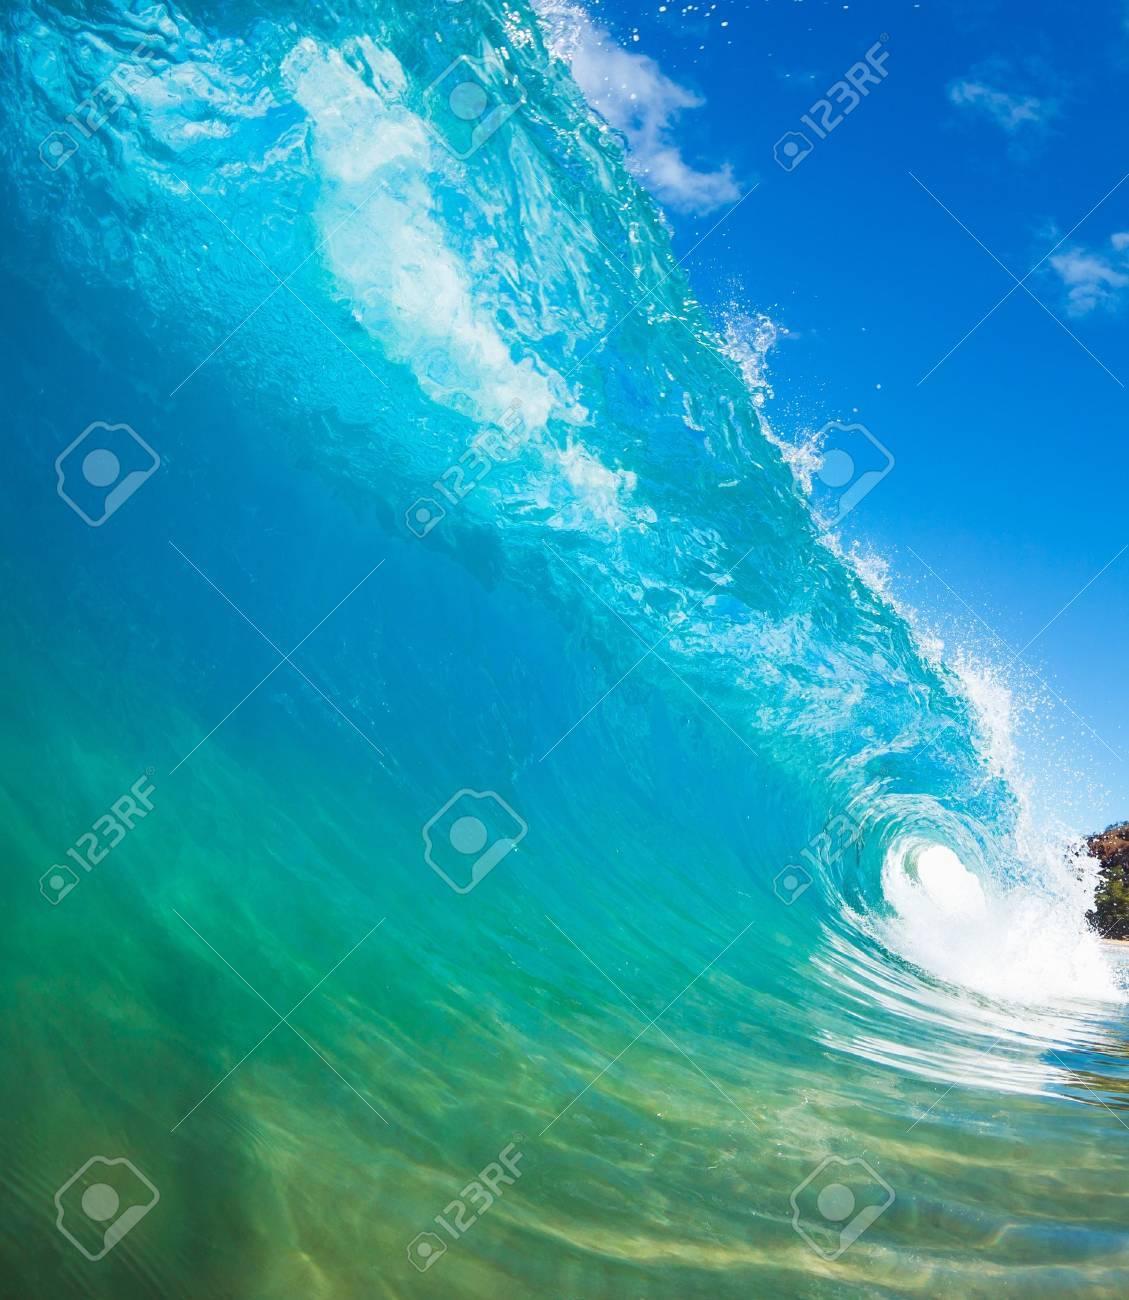 Blue Ocean Wave Stock Photo - 13542433